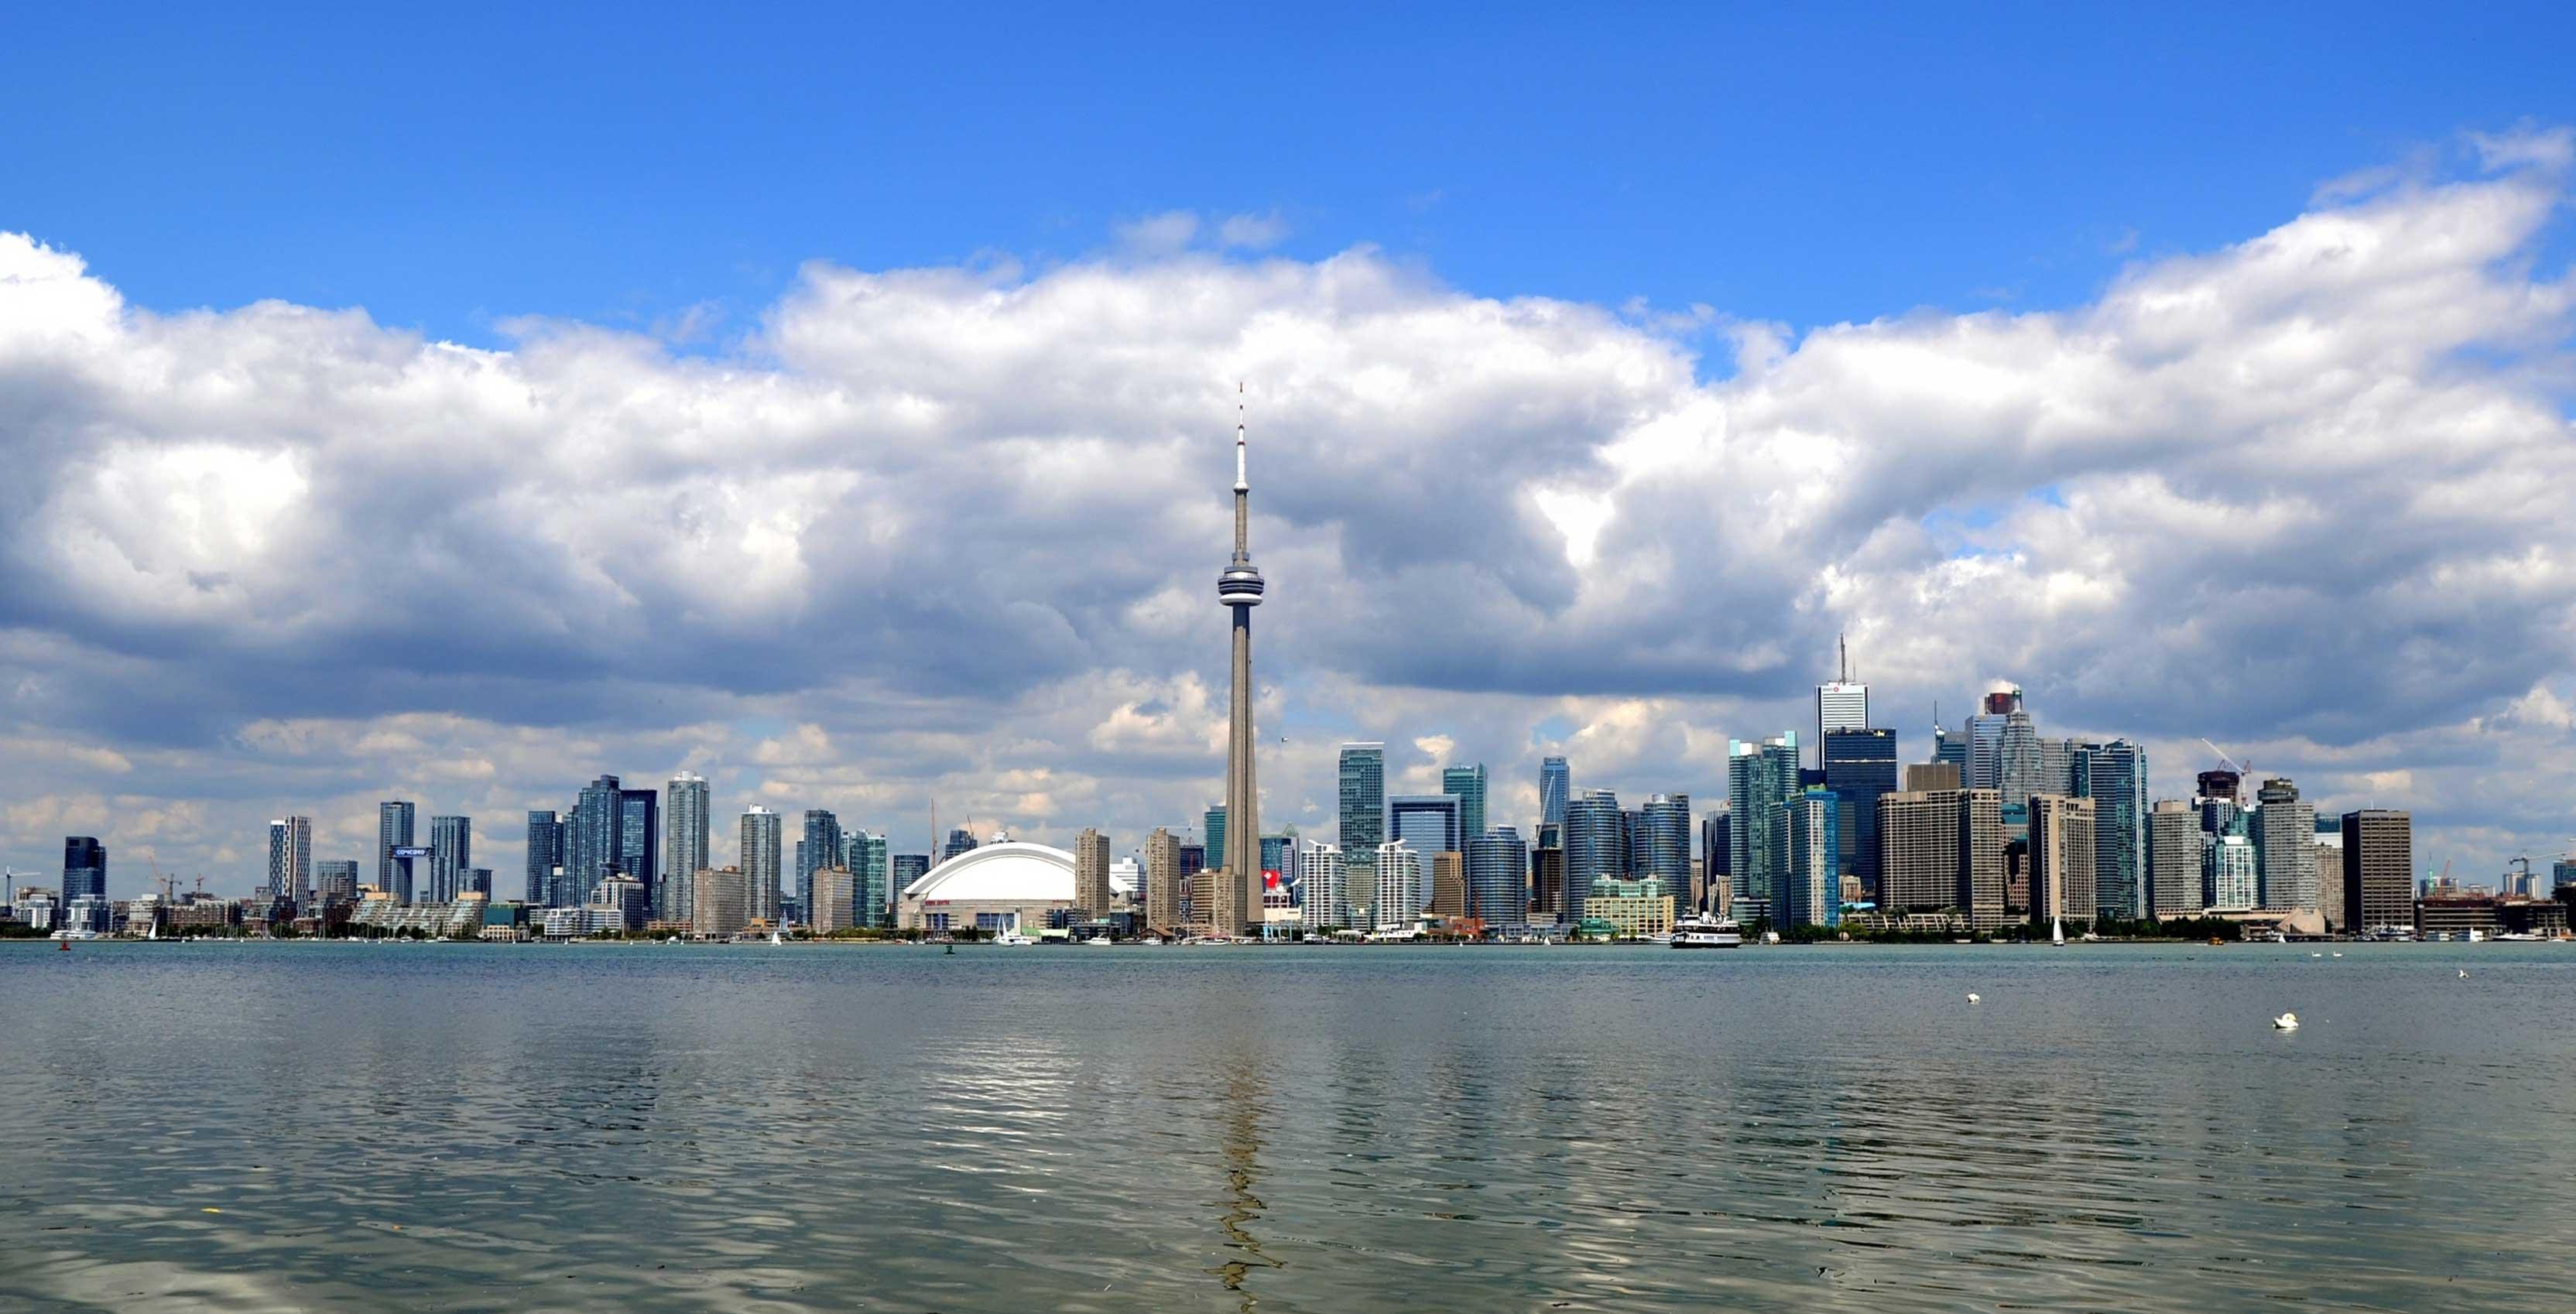 City of Toronto shot